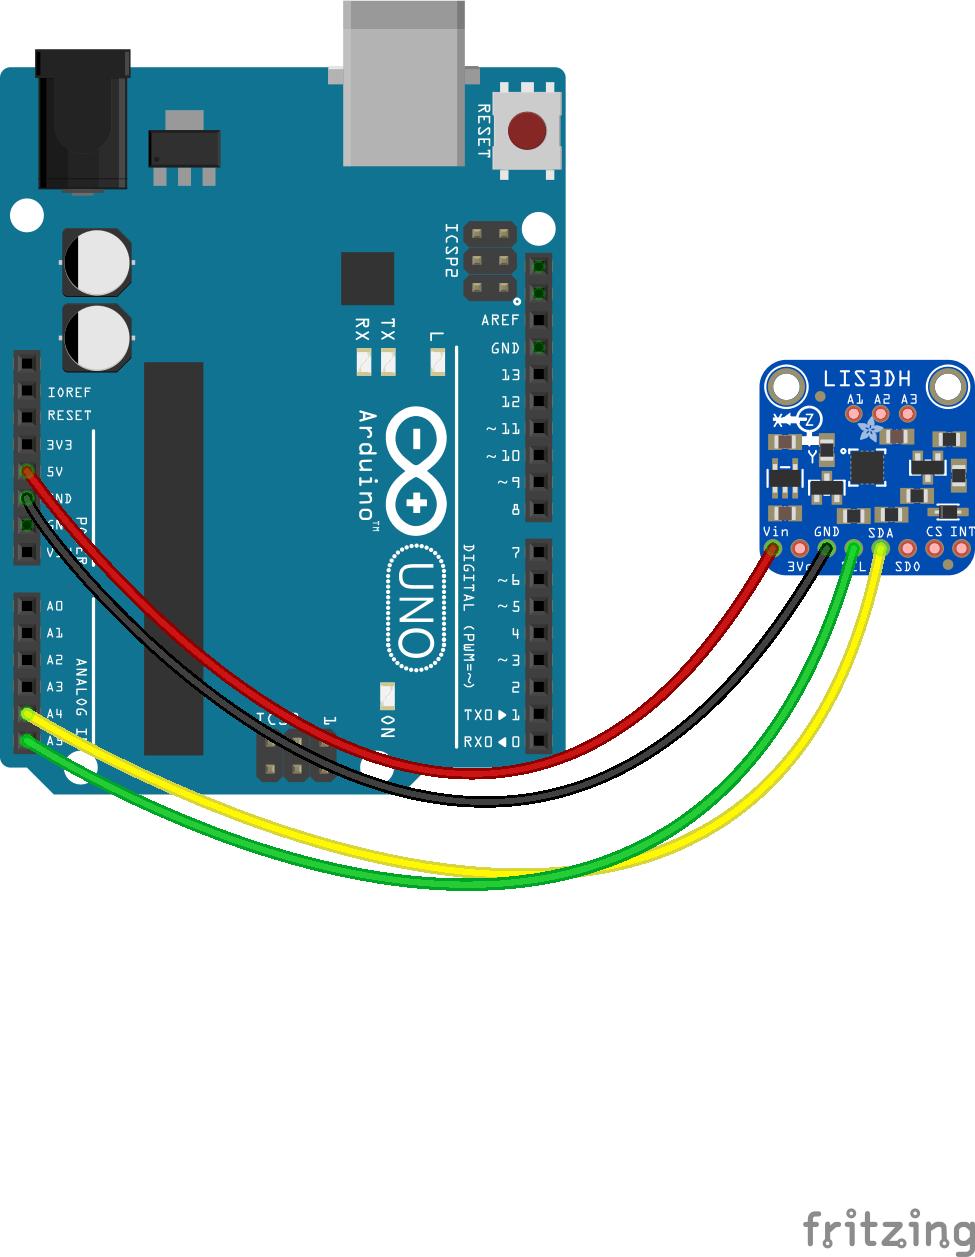 Javascript Robotics Accelerometer Lis3dh With Johnny Five Controlled Robot Circuit Diagram